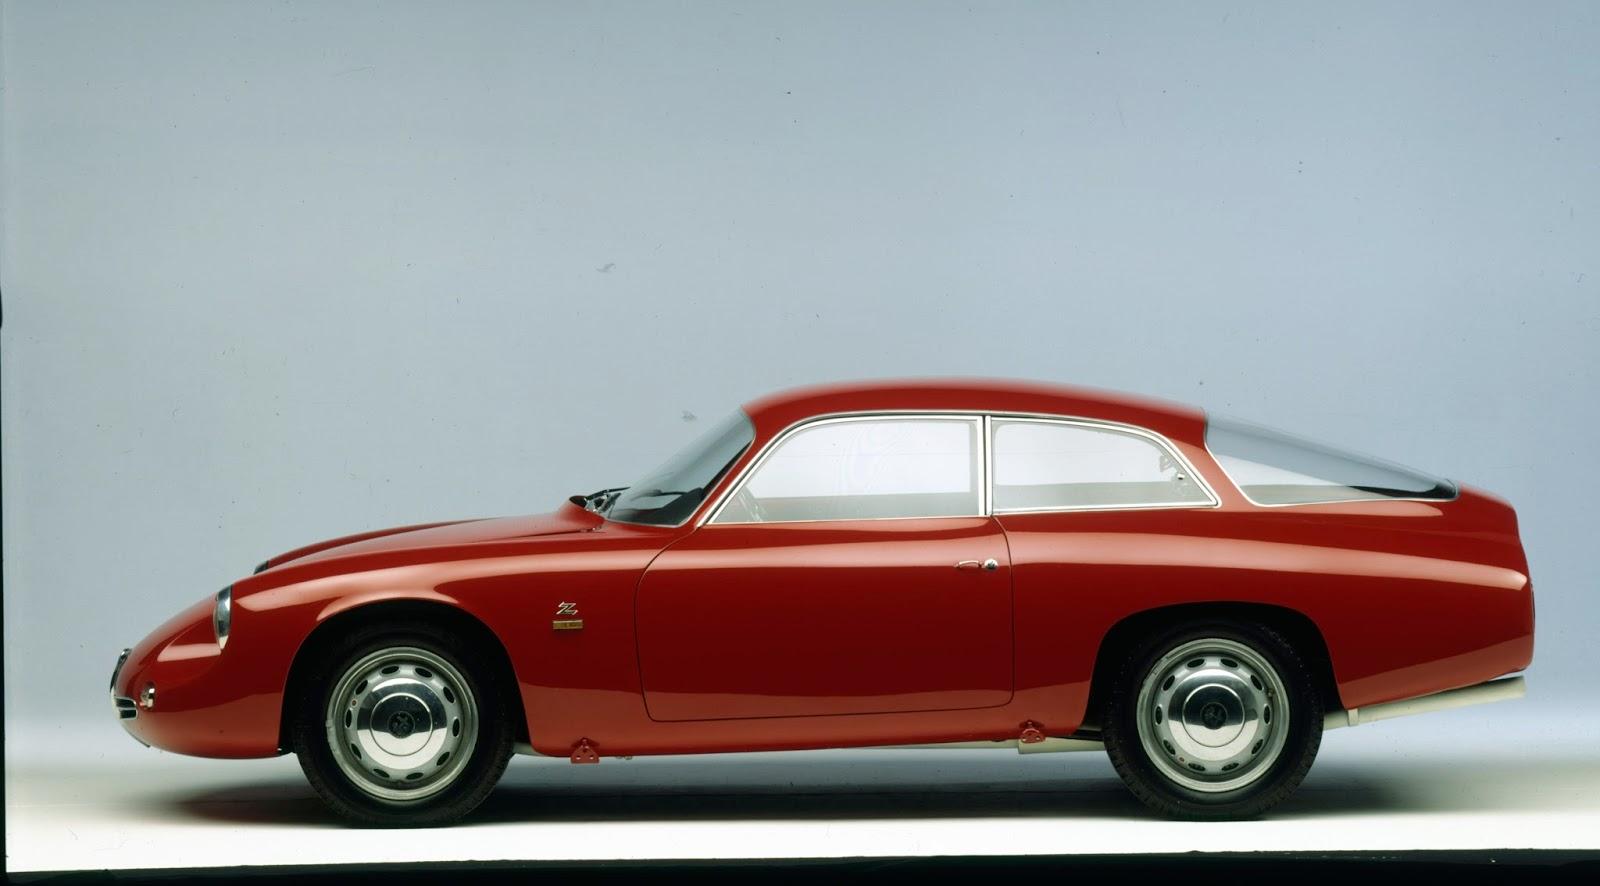 170413 Heritage Targa Florio 11 Τα ιστορικά μοντέλα της FCA επιστρέφουν στο Targa Florio Abarth, alfa romeo, Classic, Fiat, Lancia